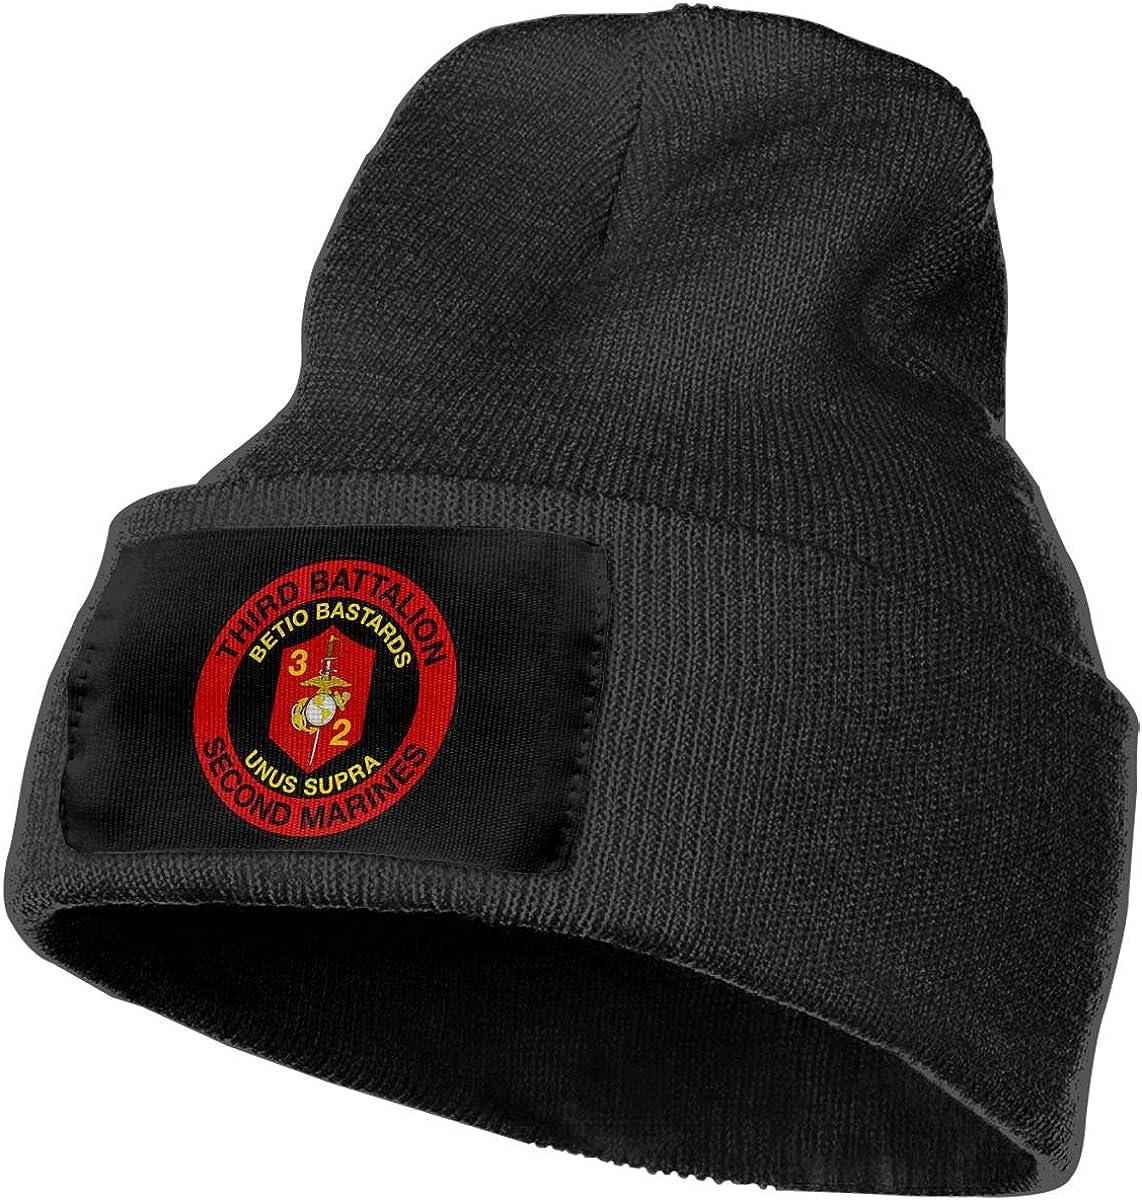 Thick,Soft,Warm Slouchy Knit Hat Winter Soft Ski Cap 2nd Marines Beanie Cap Feeke Mens/&Womens 3rd Battalion